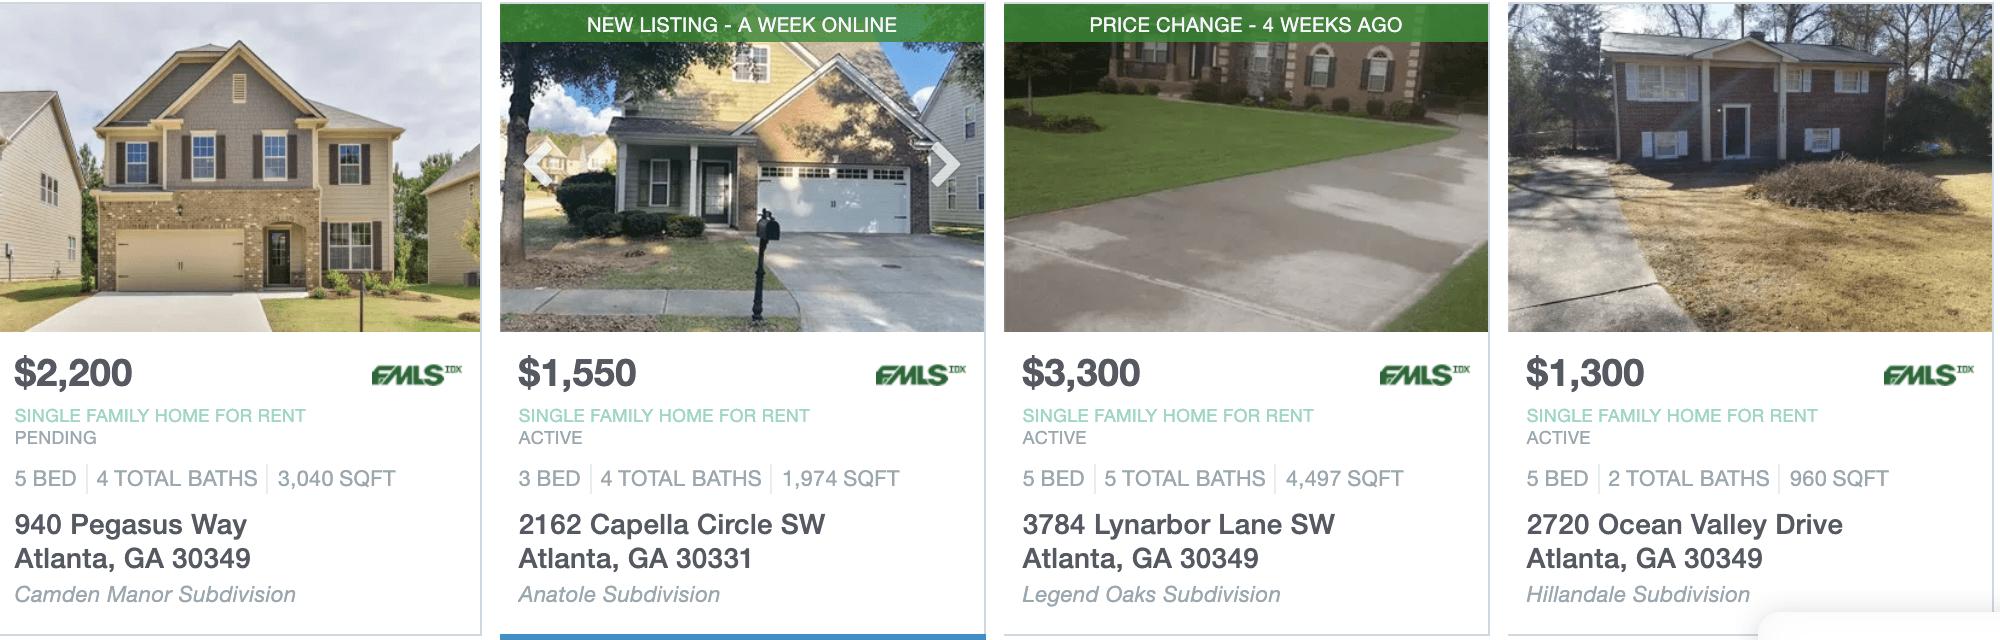 Miraculous Atlanta Homes For Rent Top Real Estate Agents In Atlanta Interior Design Ideas Jittwwsoteloinfo